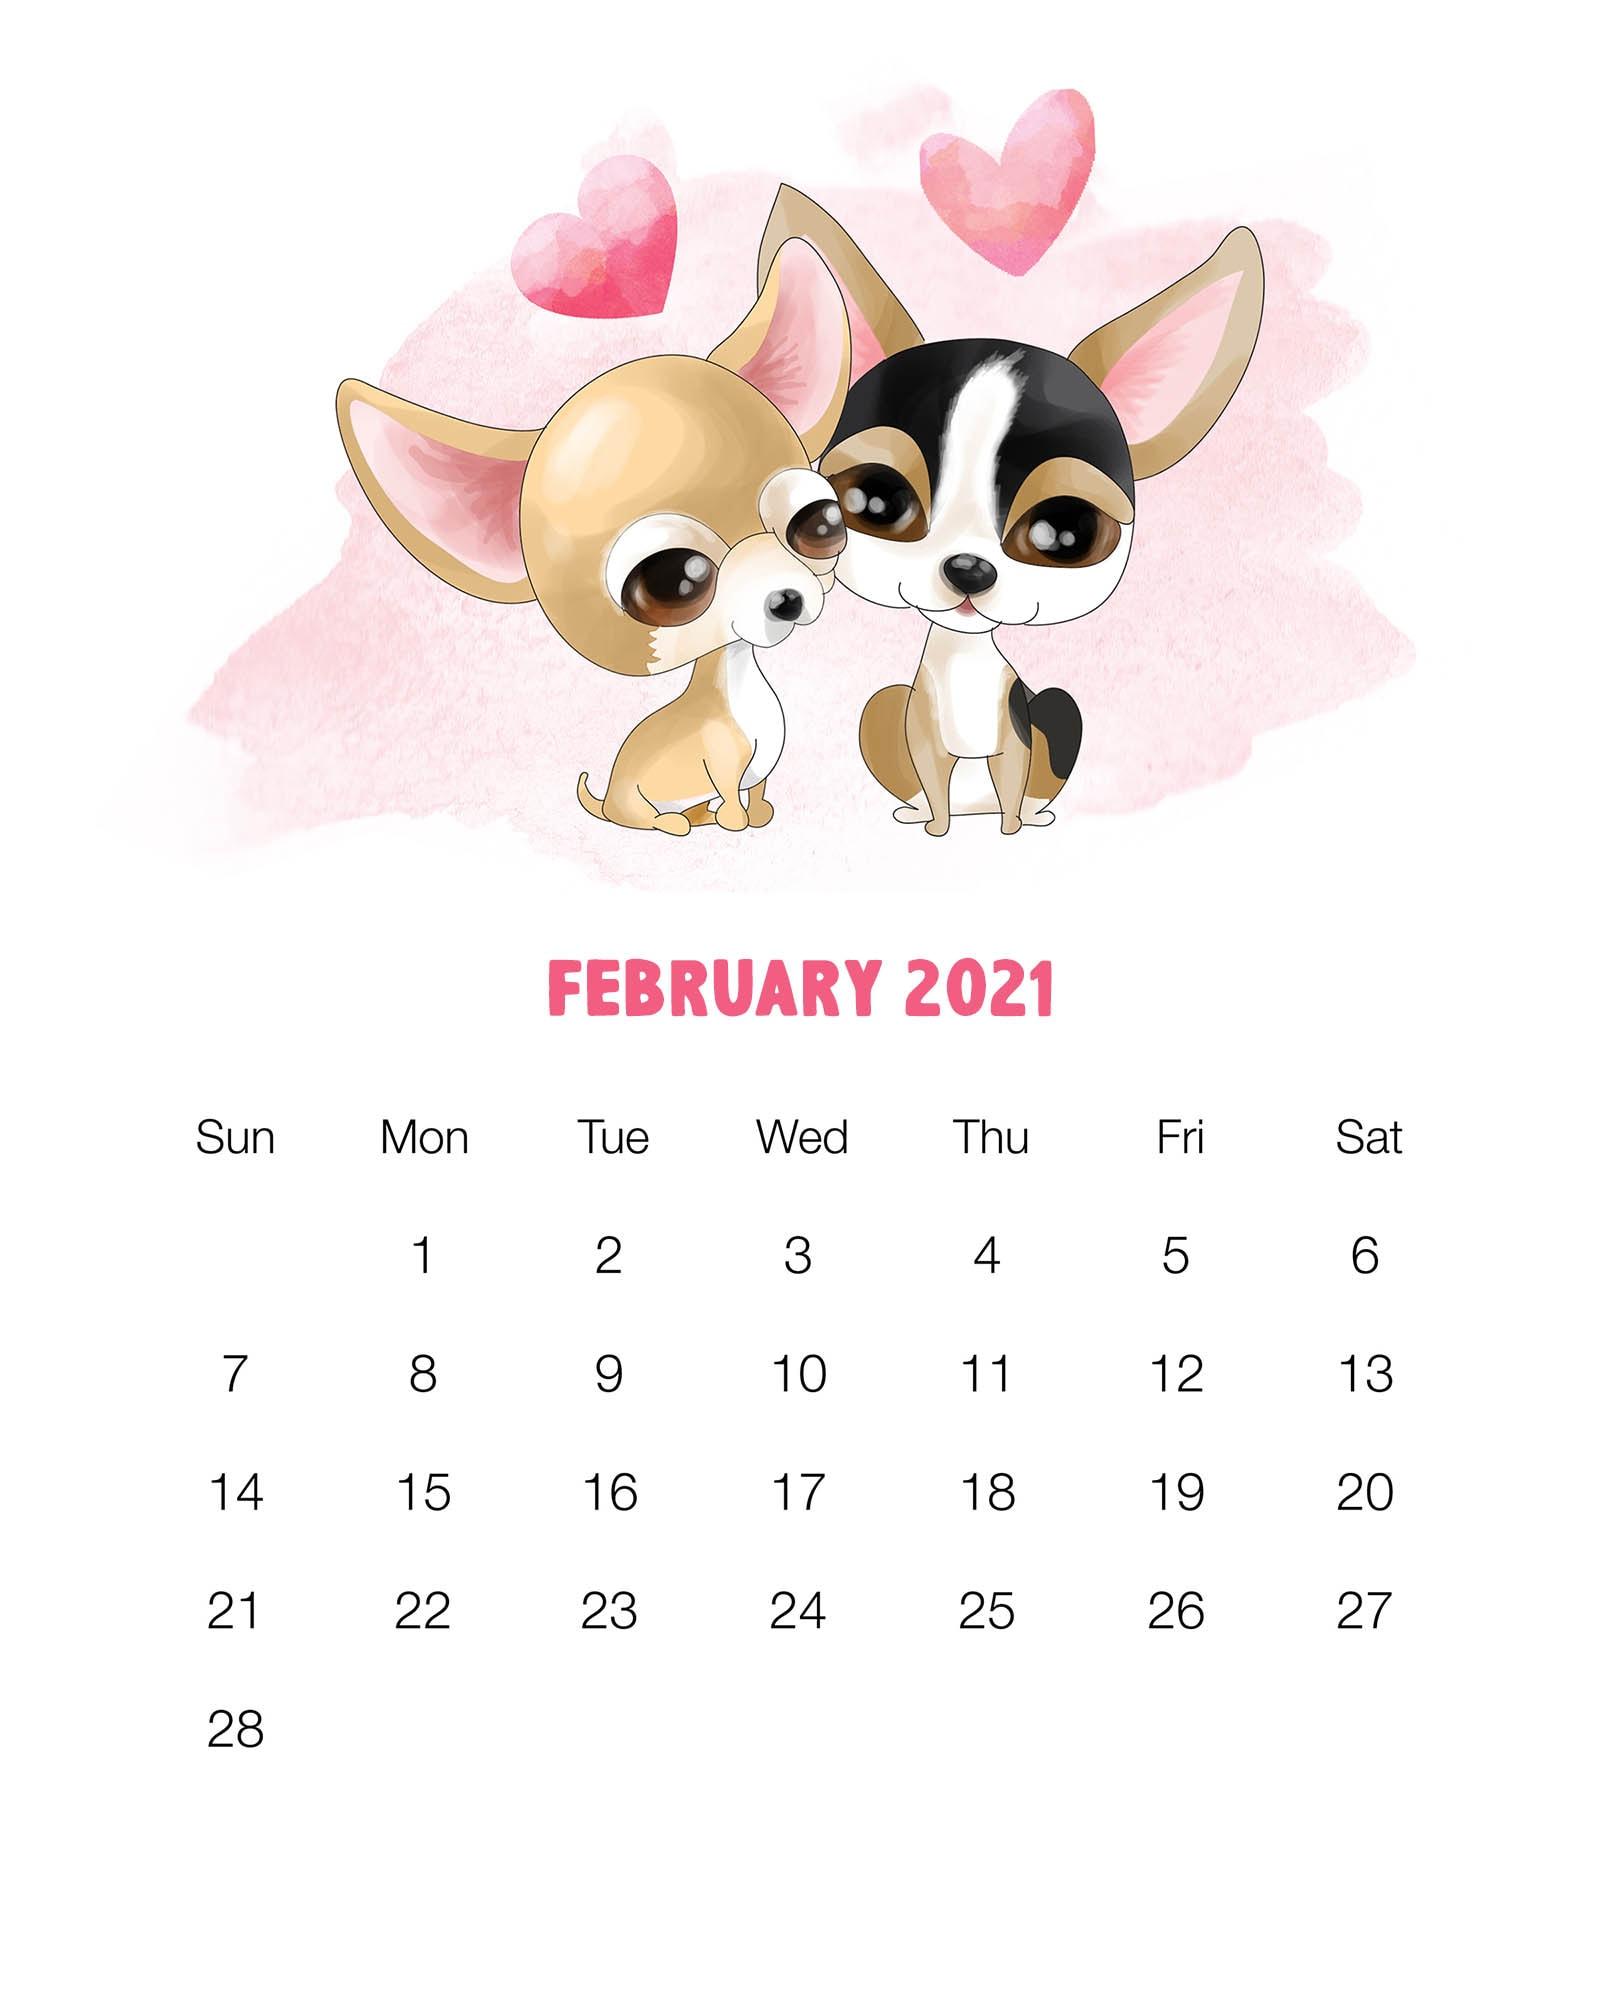 Free Printable 2021 Cute Dog Calendar - The Cottage Market